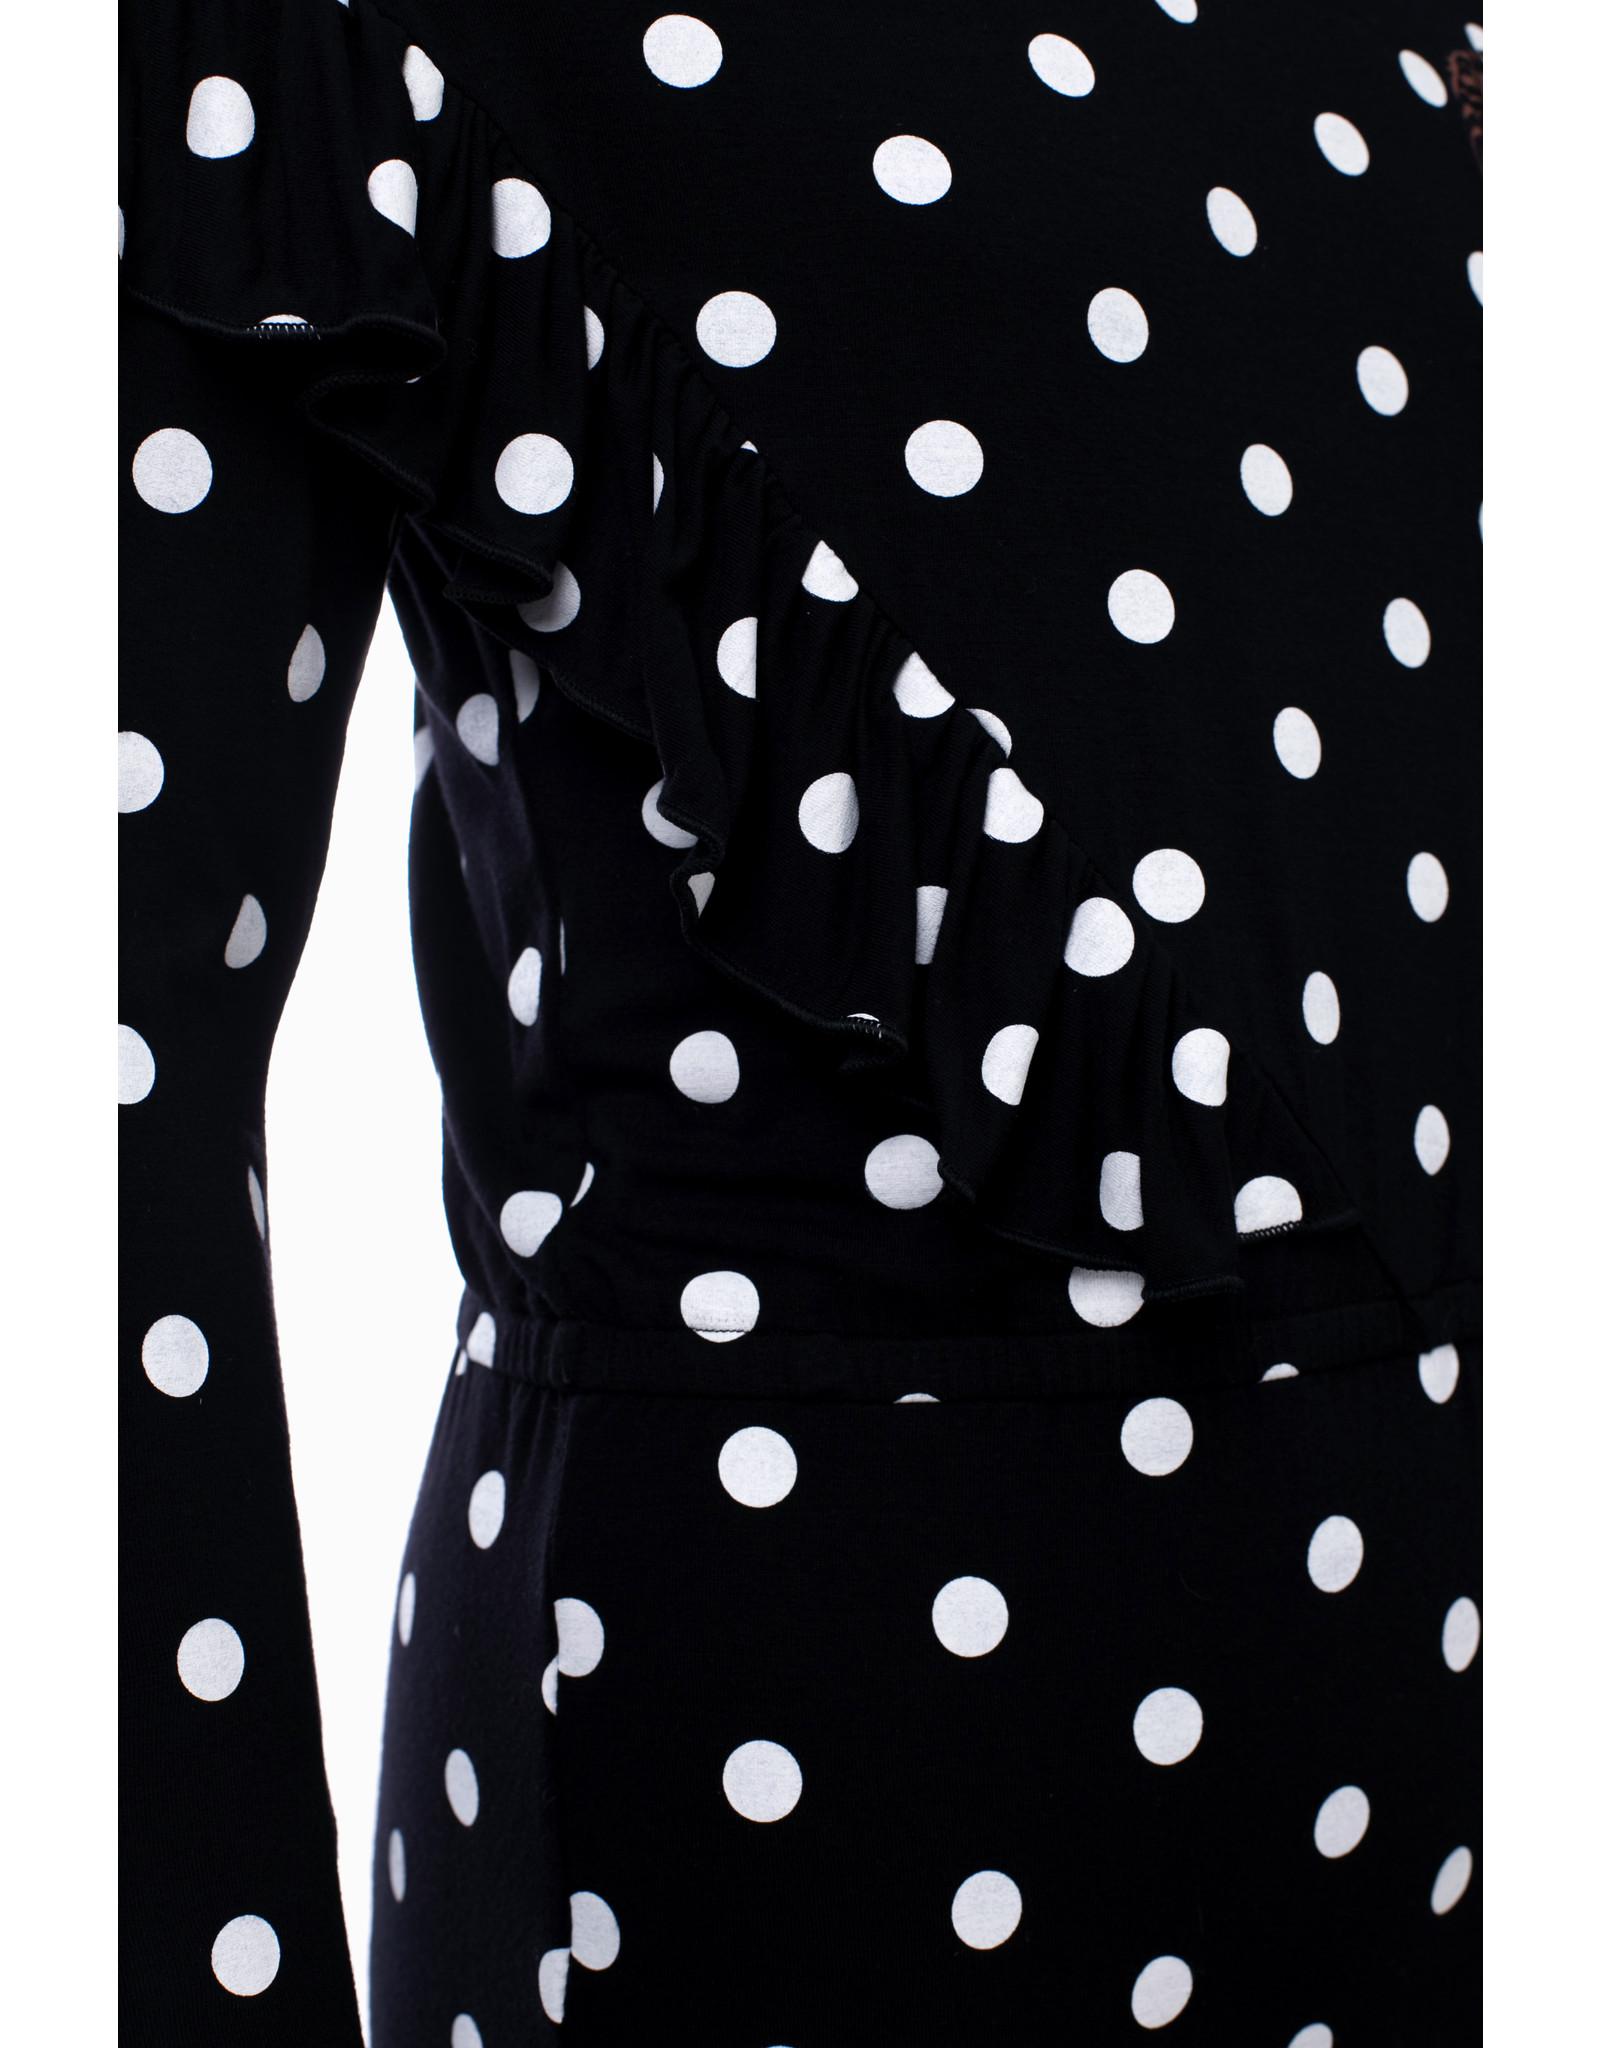 Looxs Revolution Girls L.Sleeve wrap dress